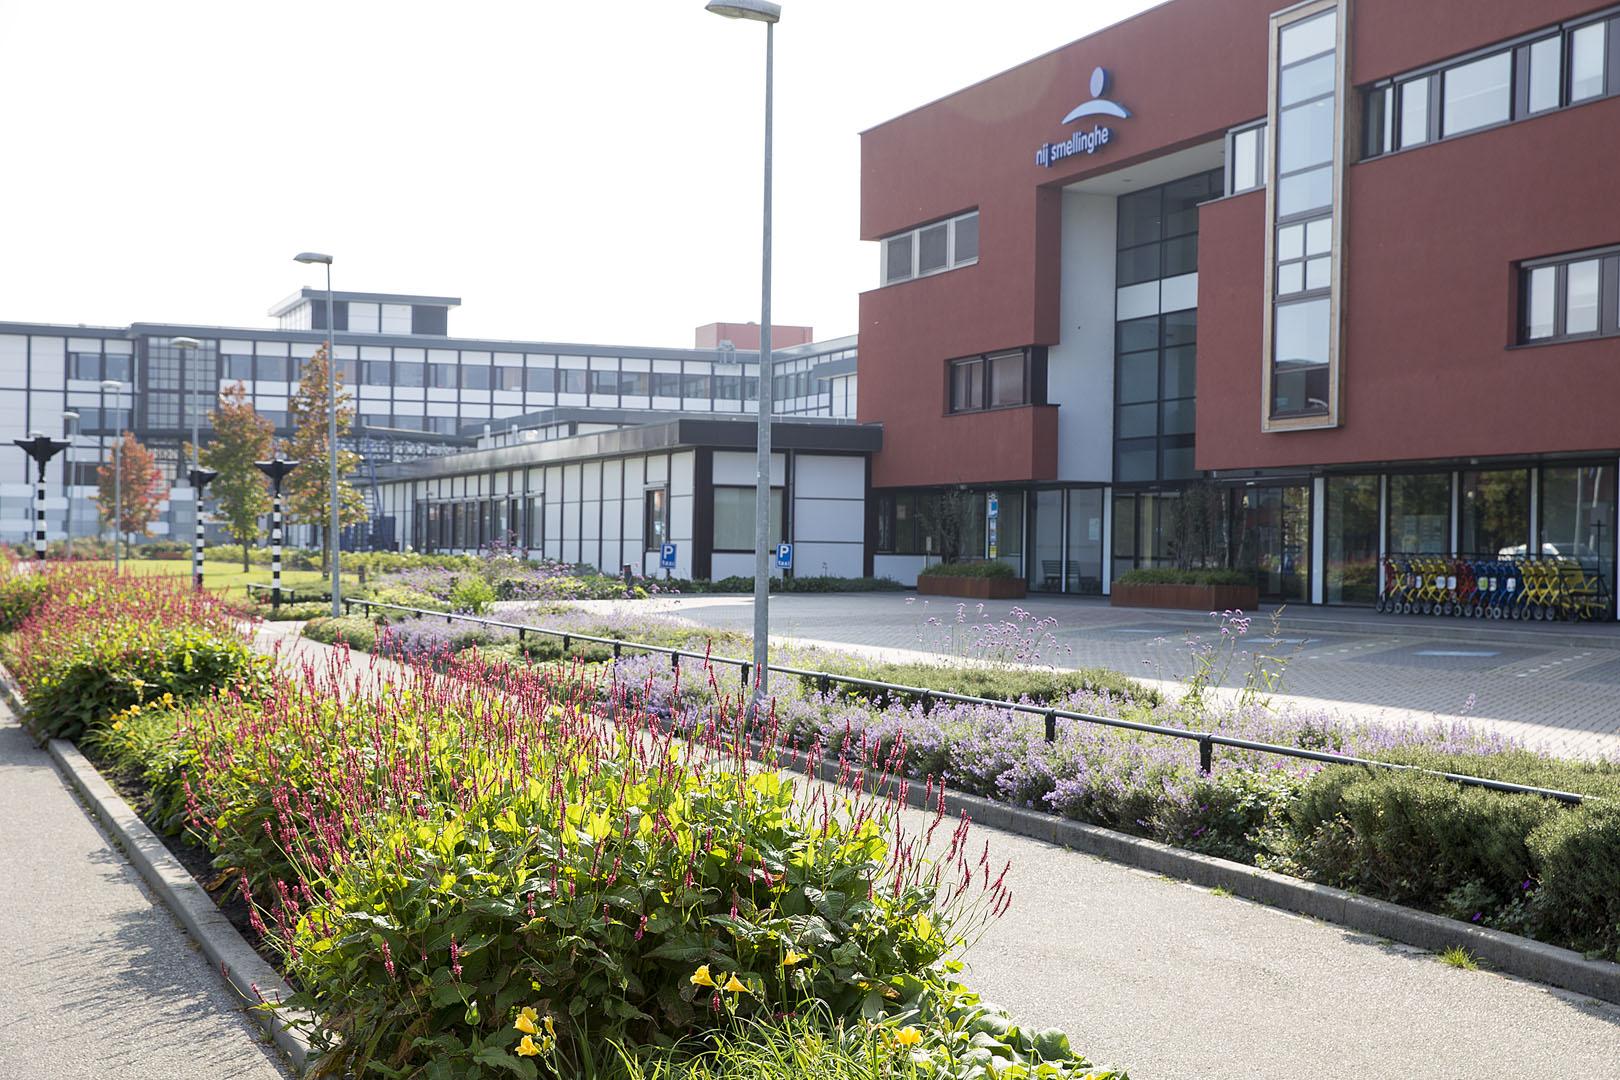 Hoveniersbedrijf Sake van der Wal Groenvoorziening Friesland 01a